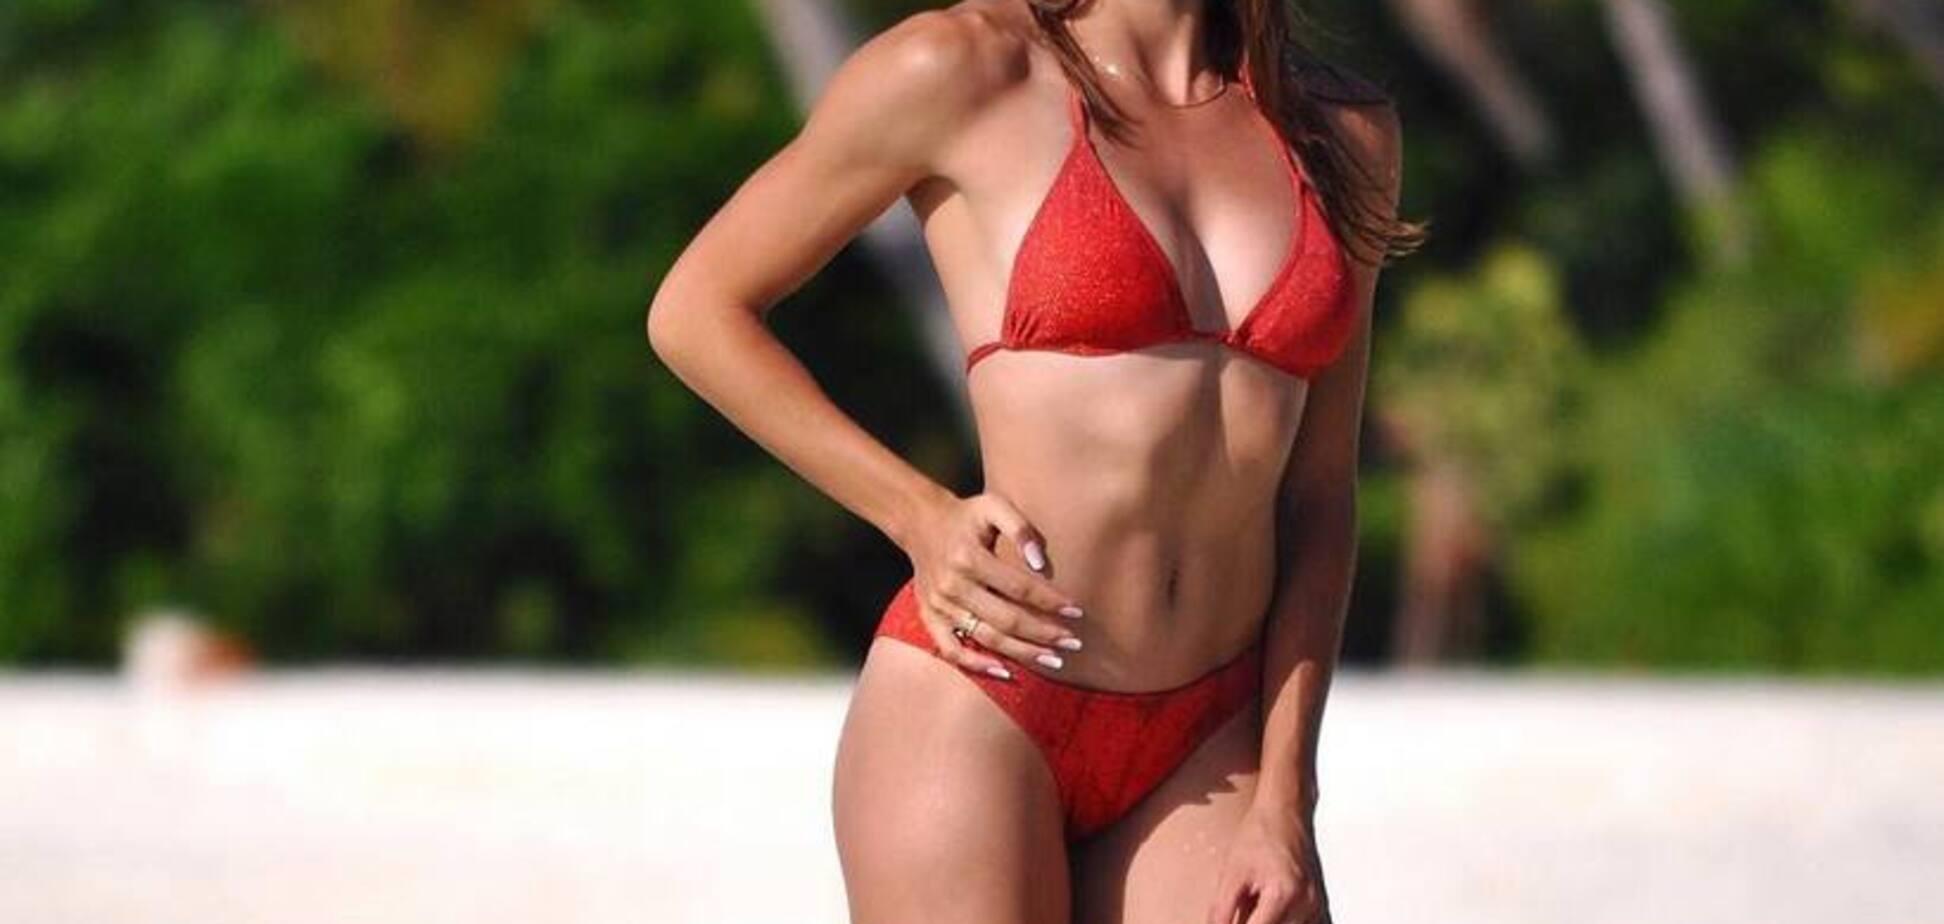 Українська чемпіонка похвалилася спокусливими фото в купальнику